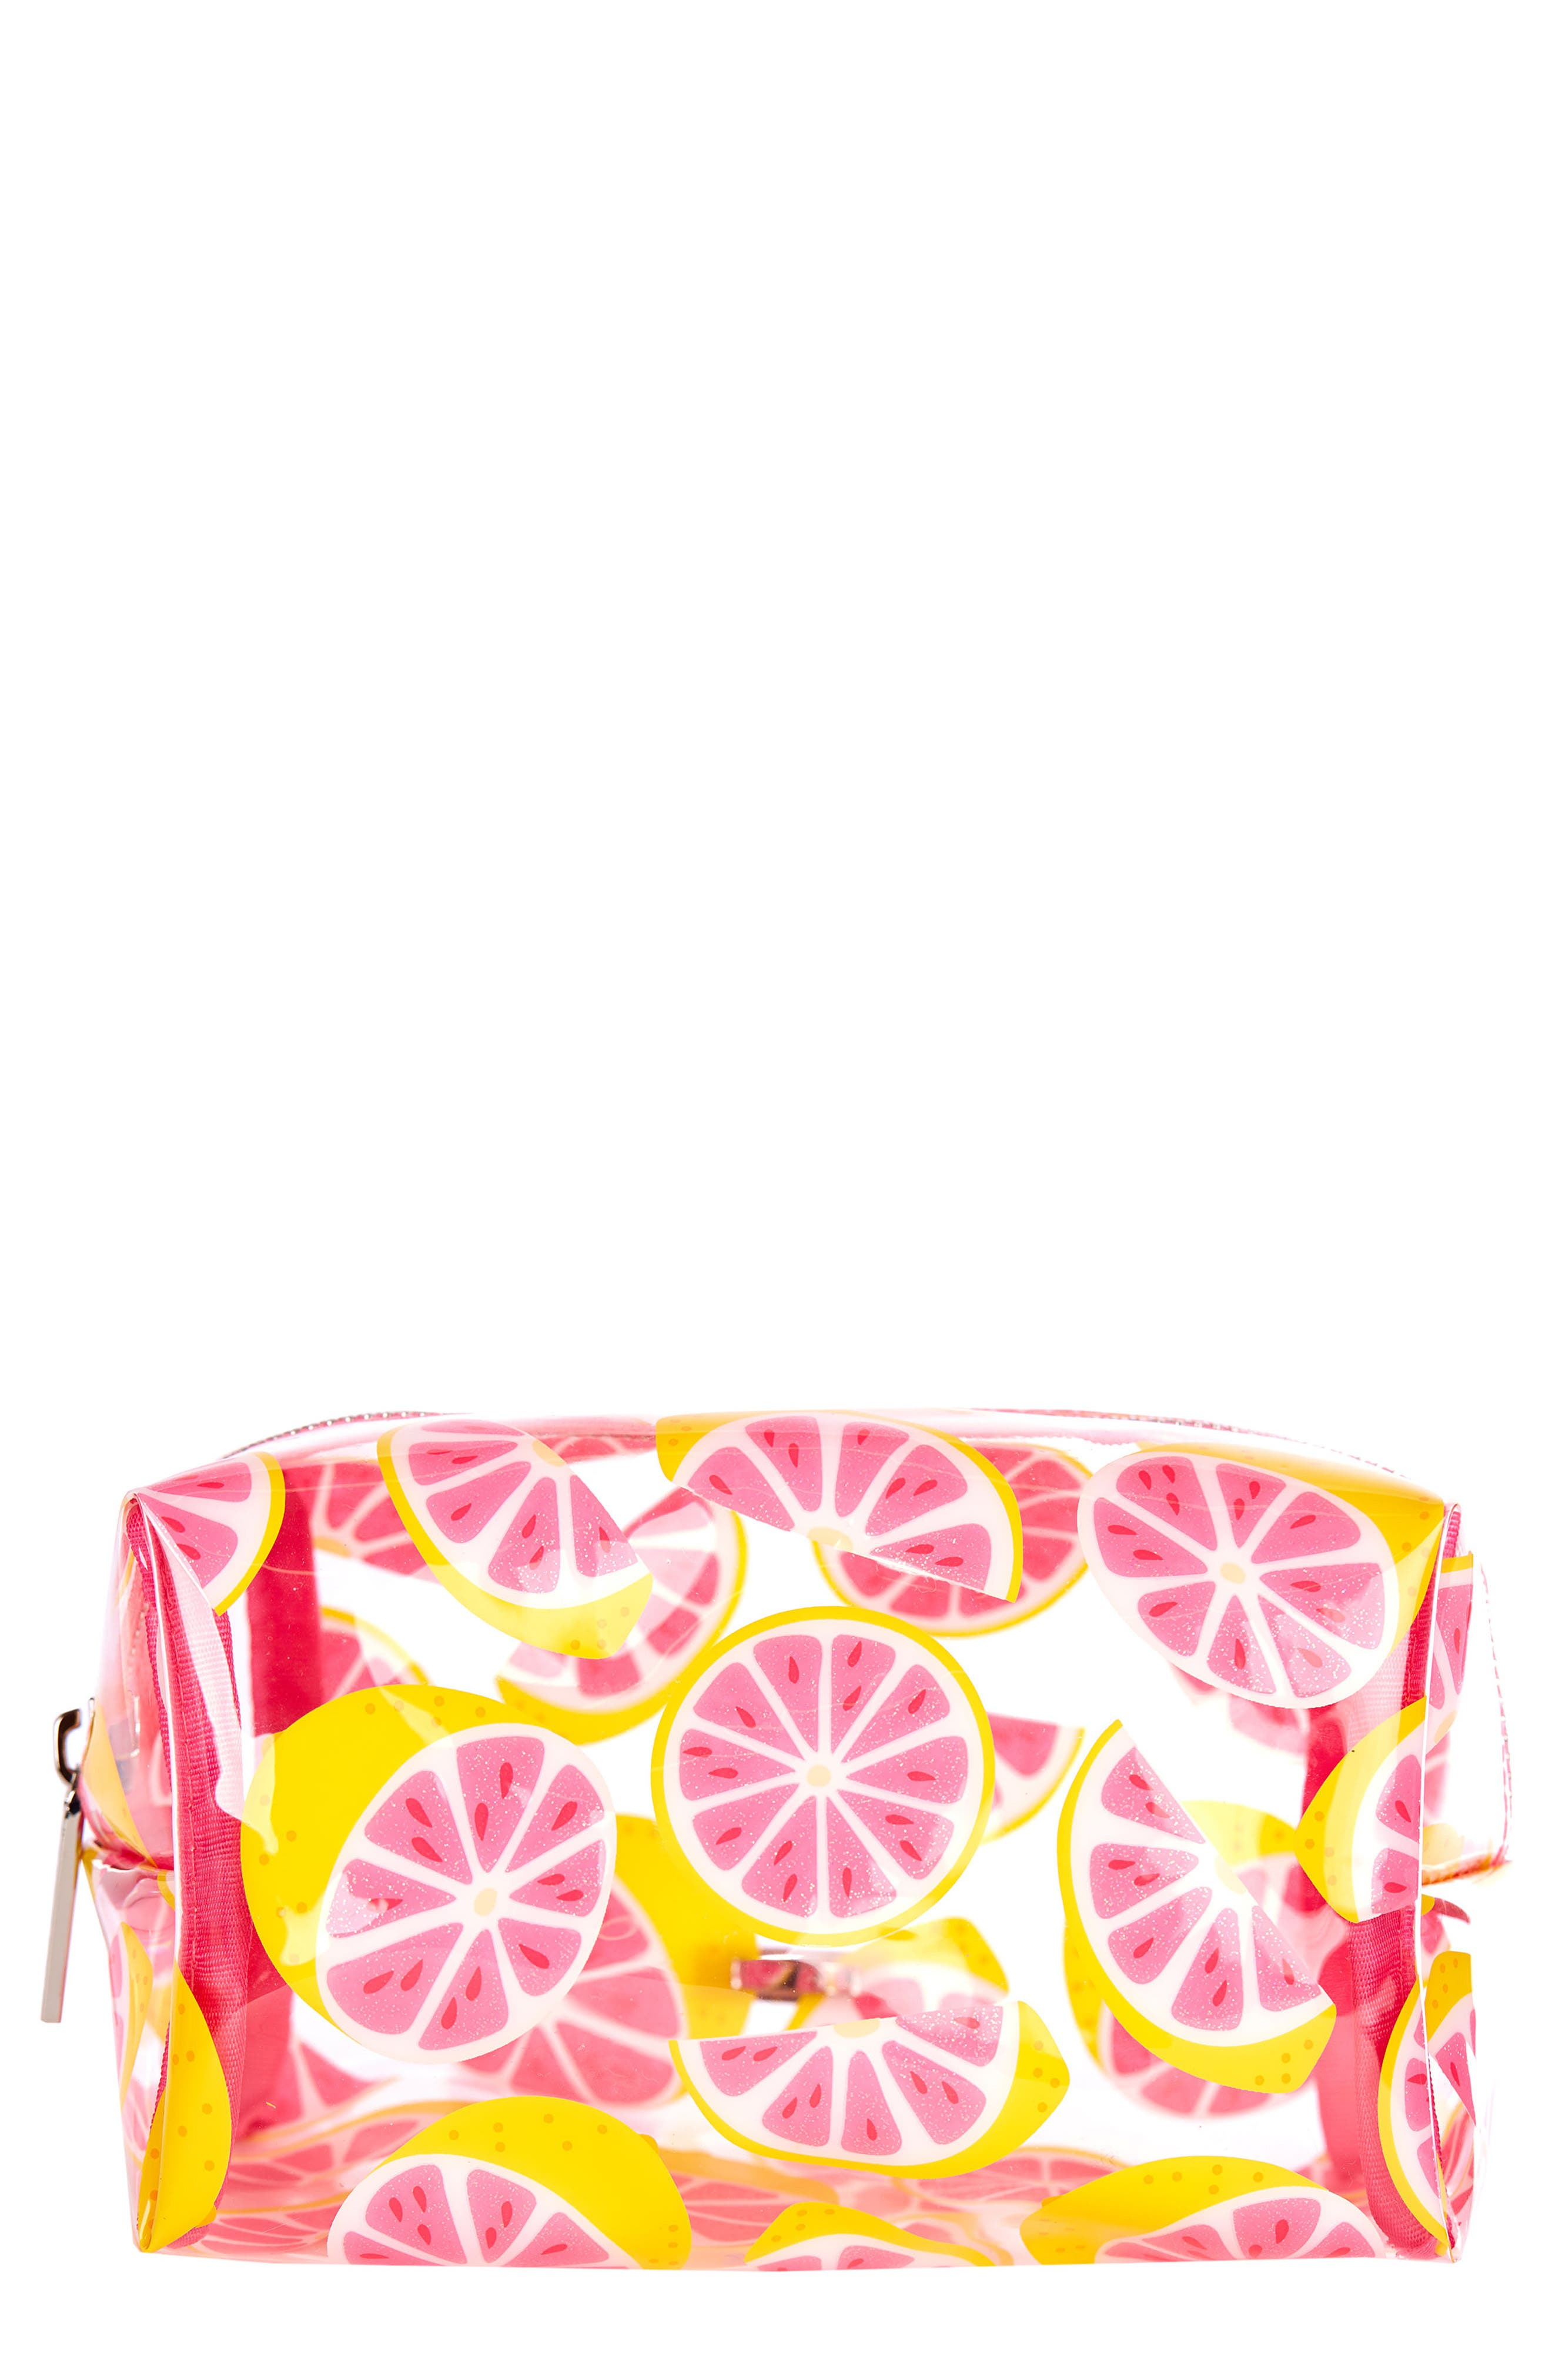 Skinny Dip Glitter Grapefruit Cosmetics Case,                             Main thumbnail 1, color,                             NO COLOR